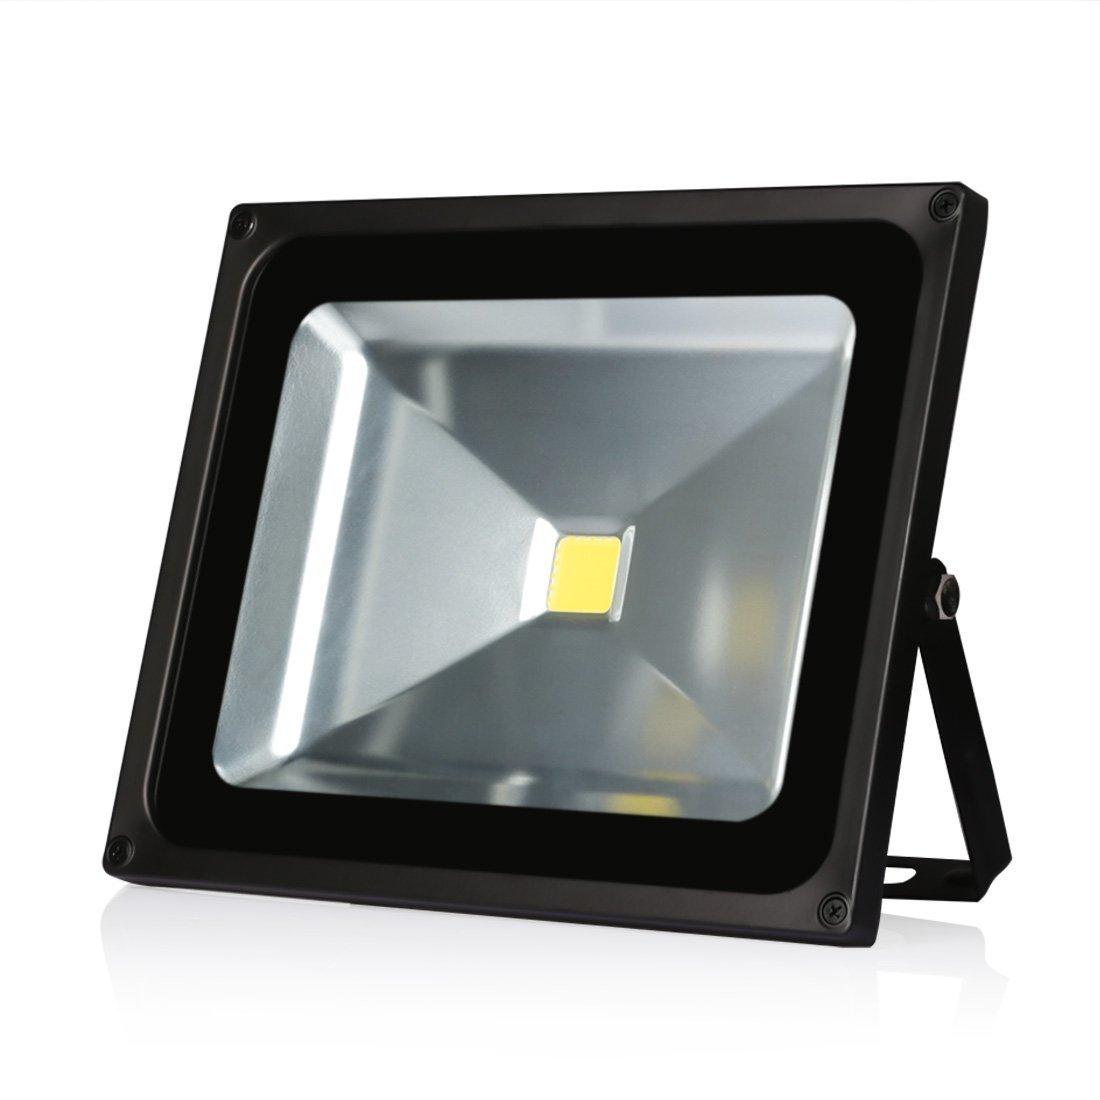 Ledmo LEDフラッドライト、防水規格ip65屋外、デイライトホワイト、6000 K、4000lm、投光照明 30W EZ853 B015DK1SKM 14876 30W  30W